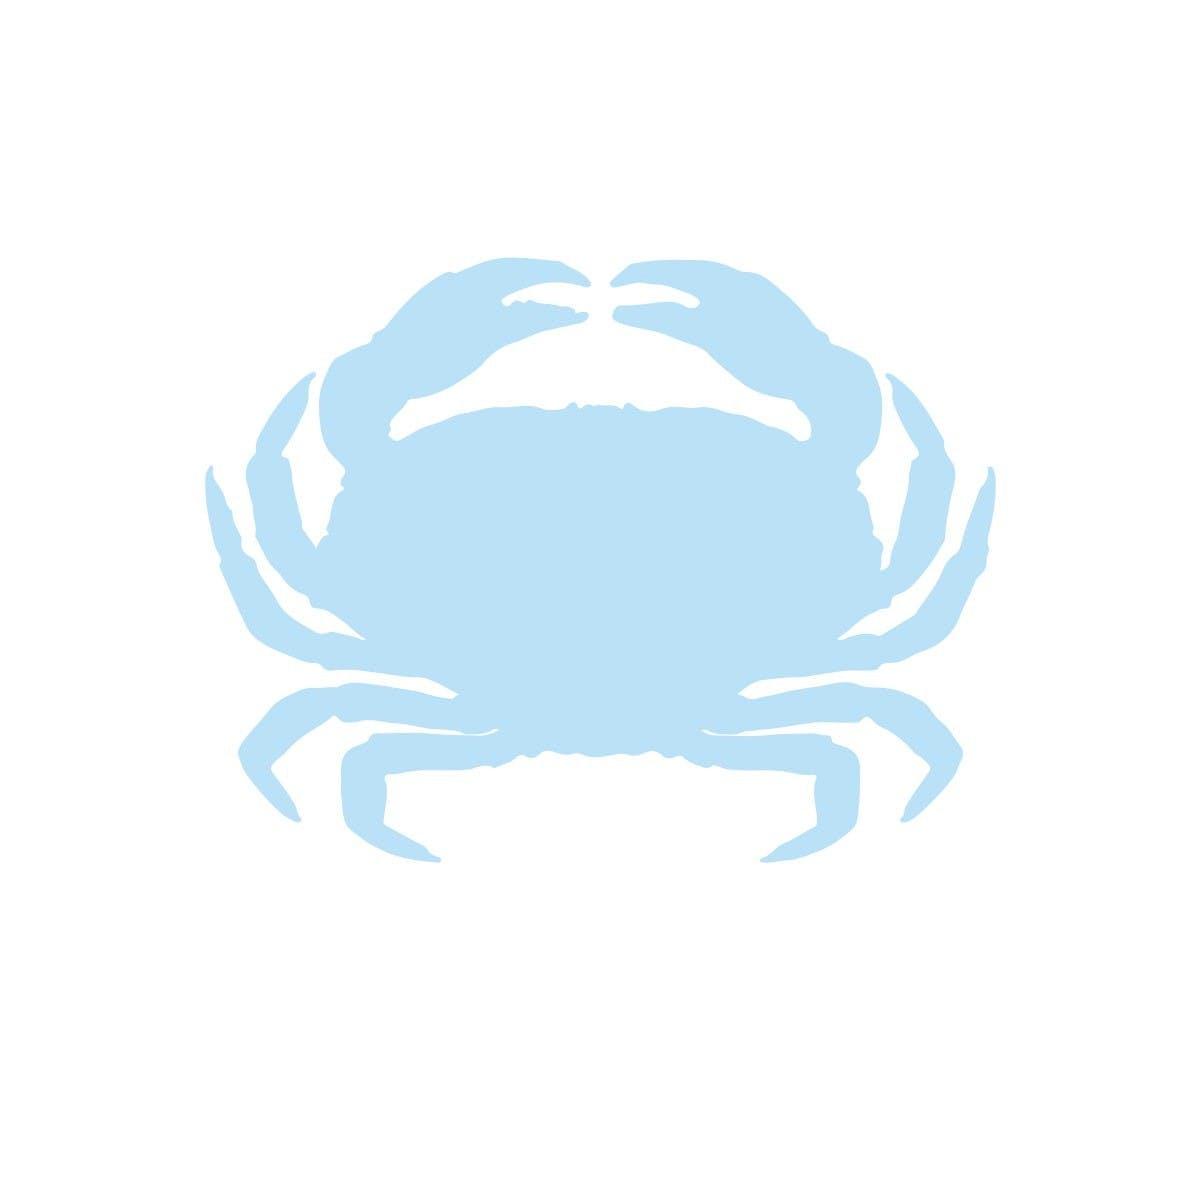 Crab Image - 1